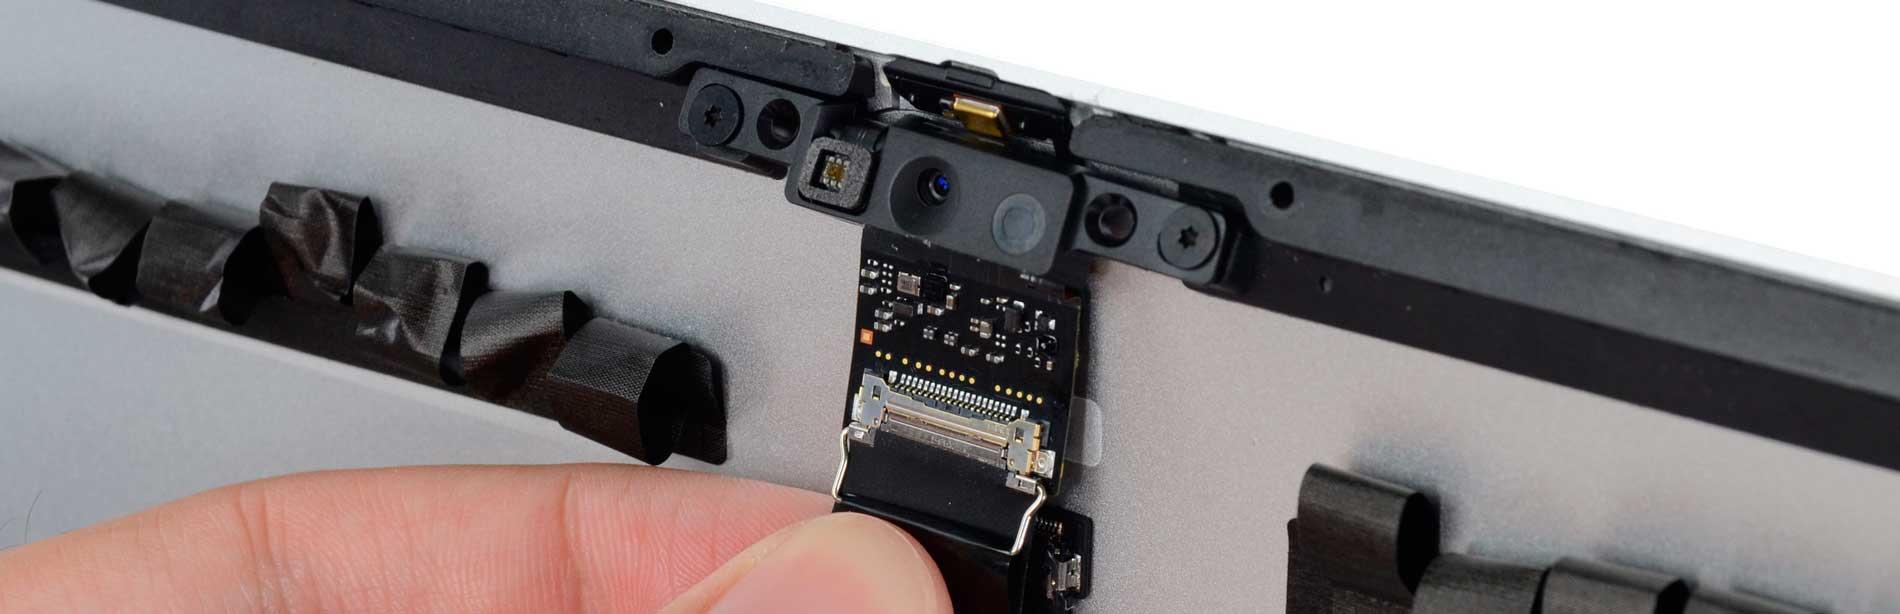 Замена микрофона iMac